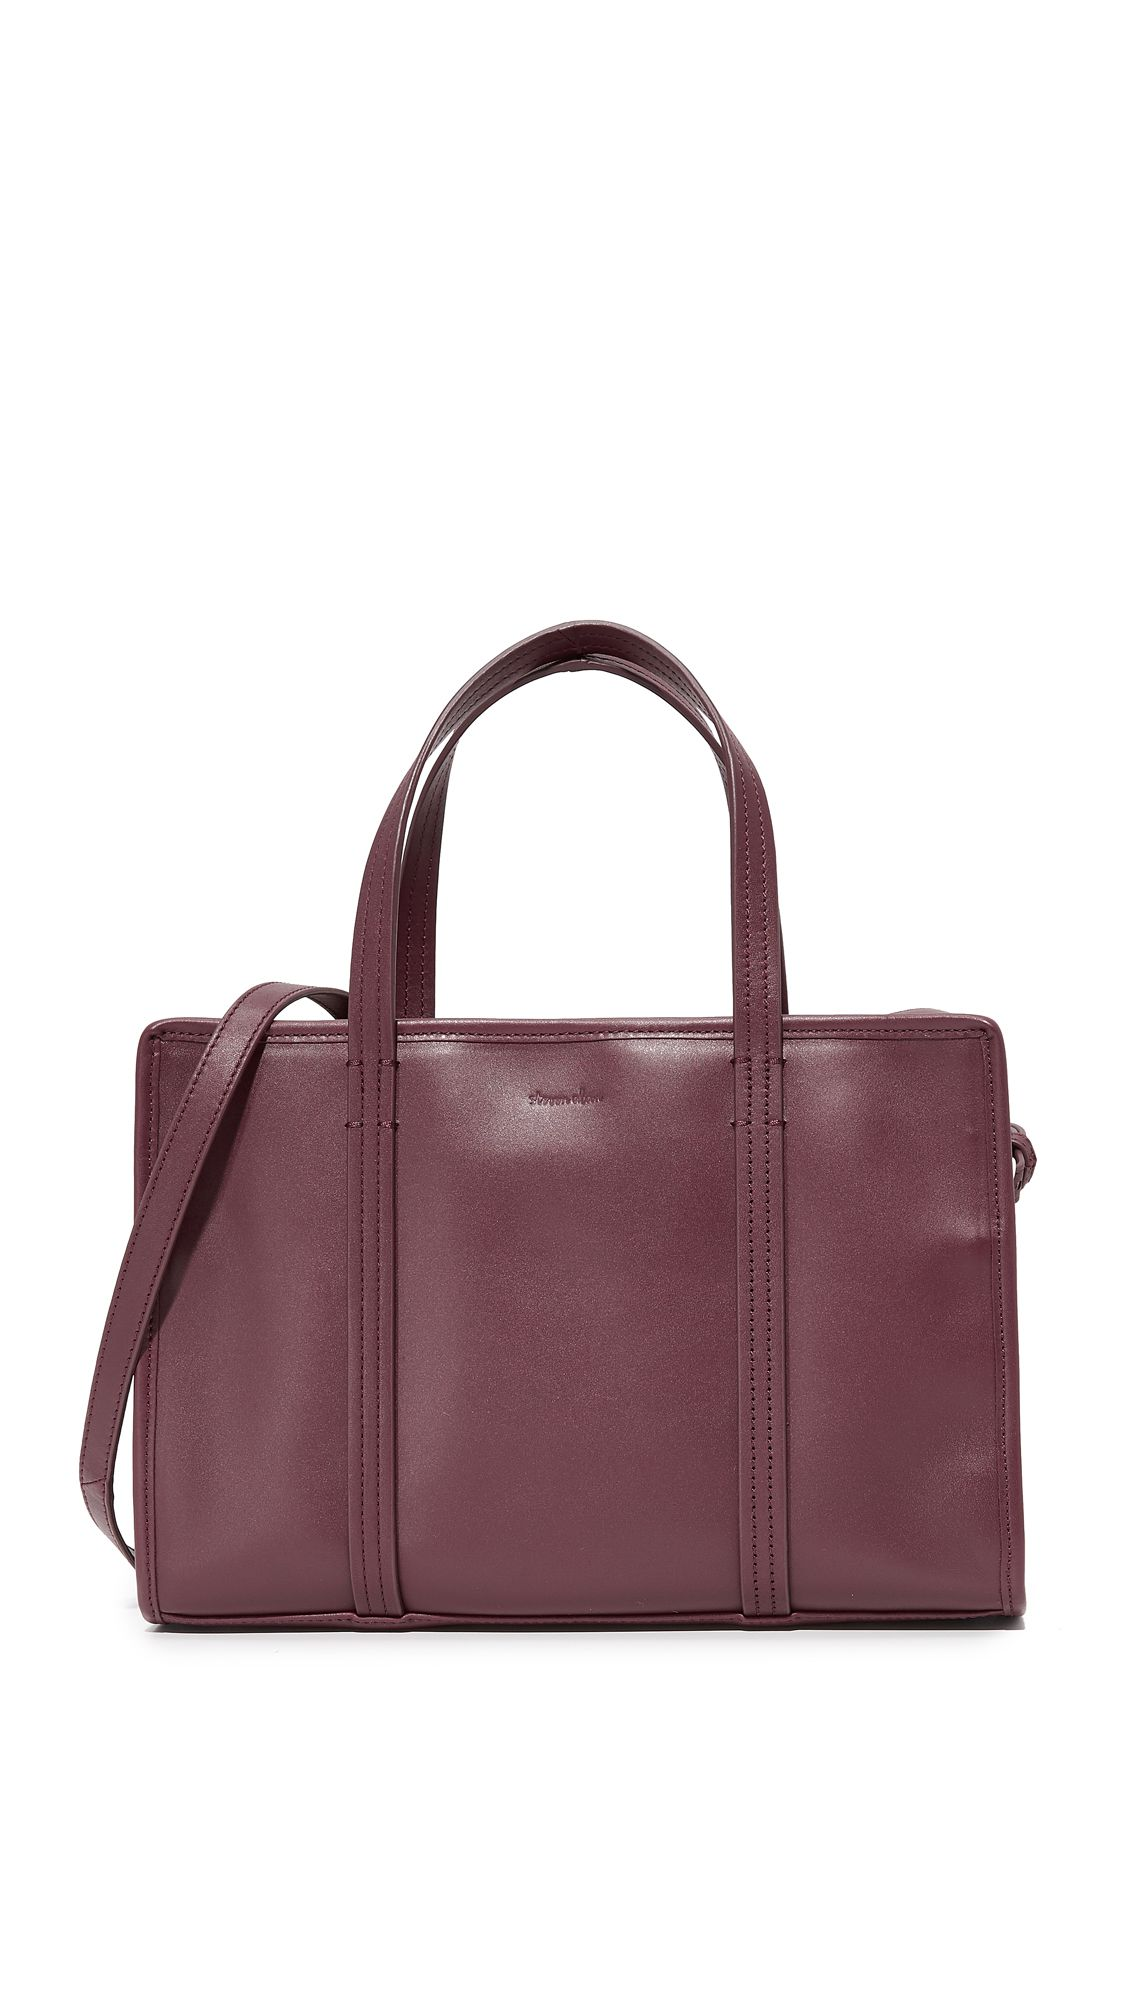 A burgundy leather satchel bag